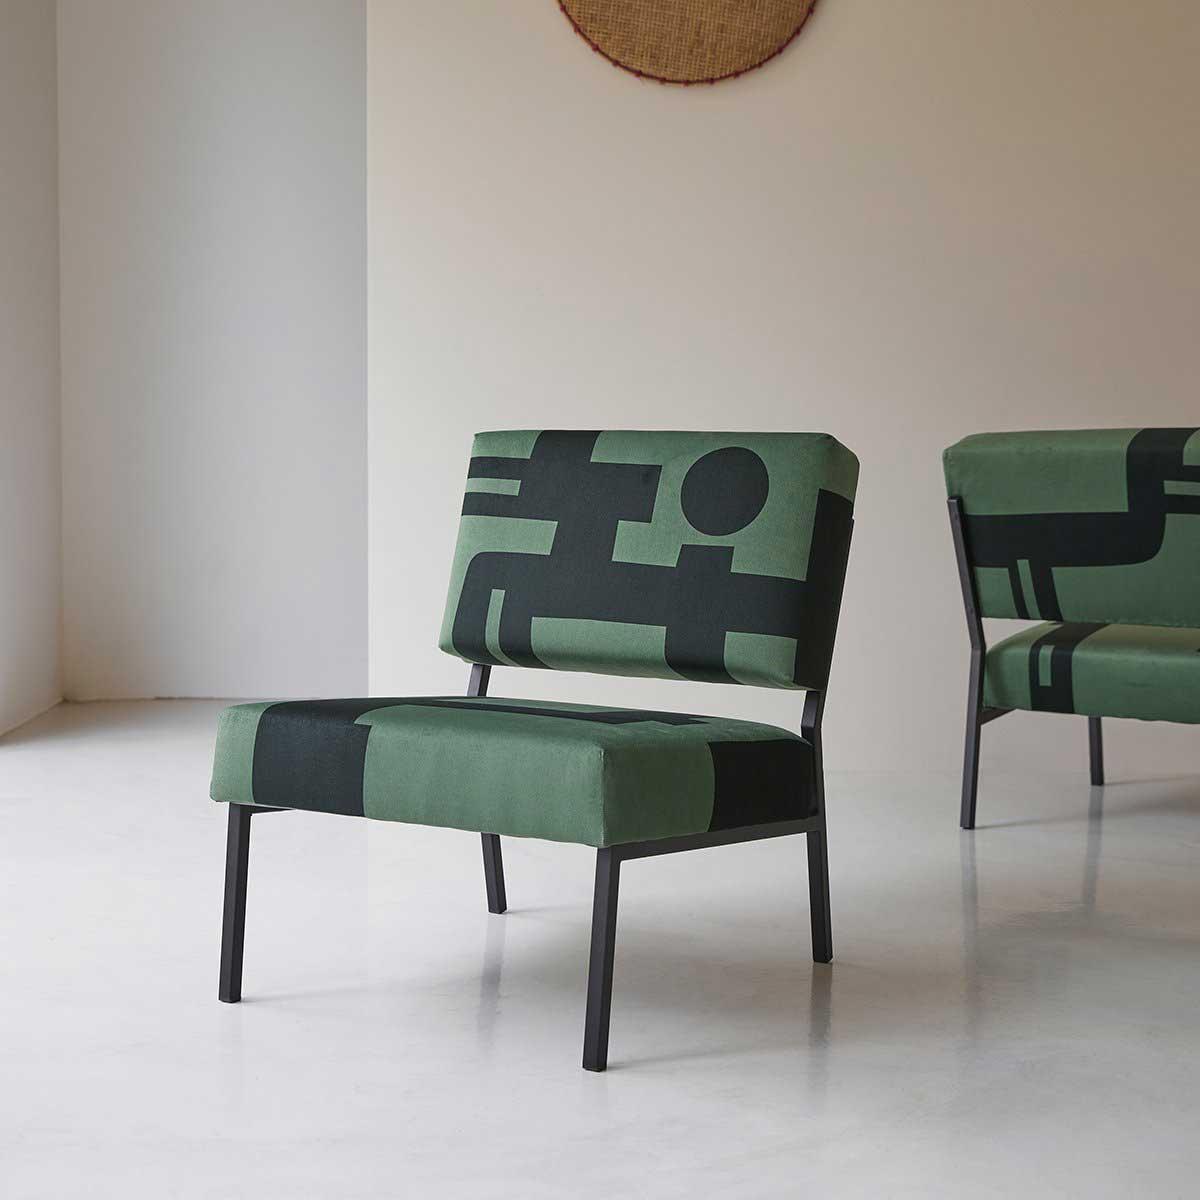 Fauteuil original : 22 designs au style atypique